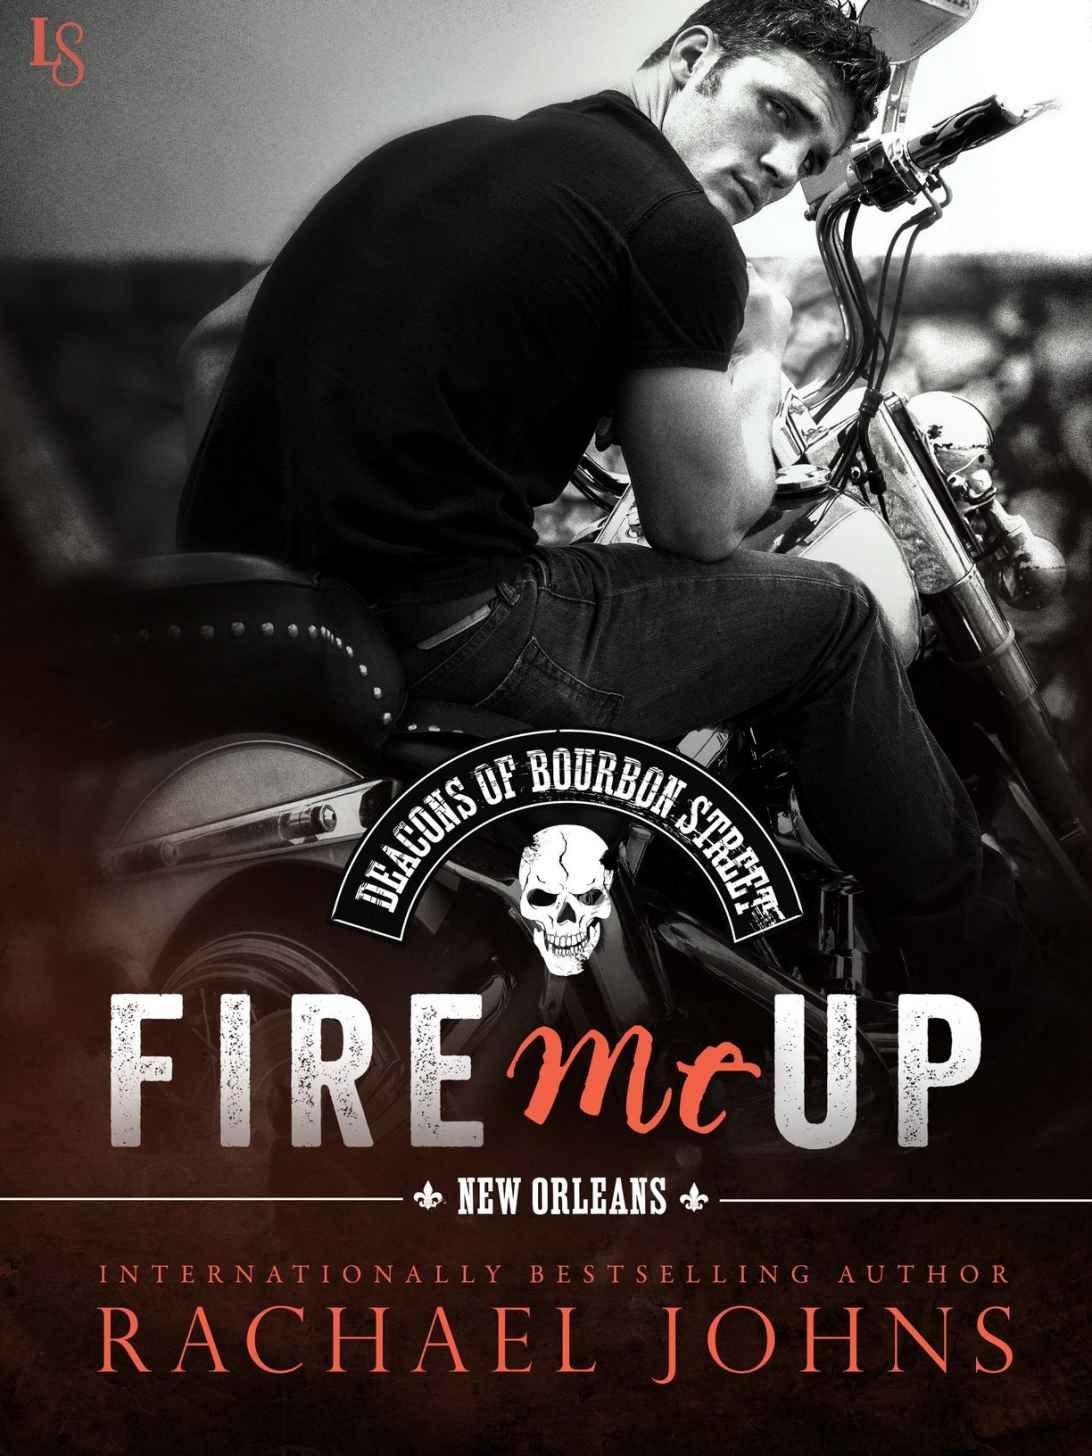 Fire Me Up (The Deacons of Bourbon Street), Rachael Johns - Amazon.com